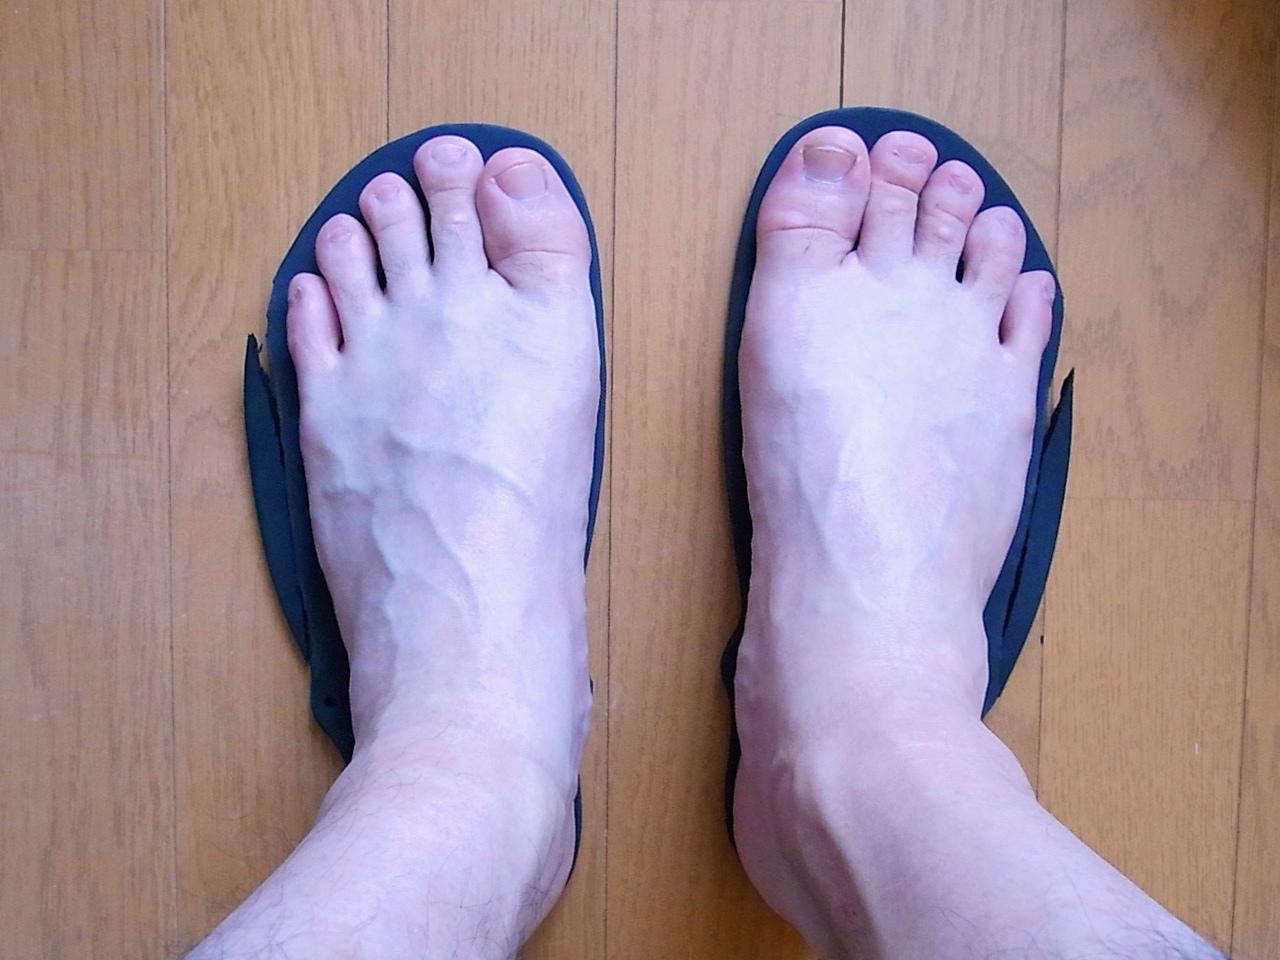 2013.4.7 Xero Shoes Kitsをつくる_b0219778_0124561.jpg